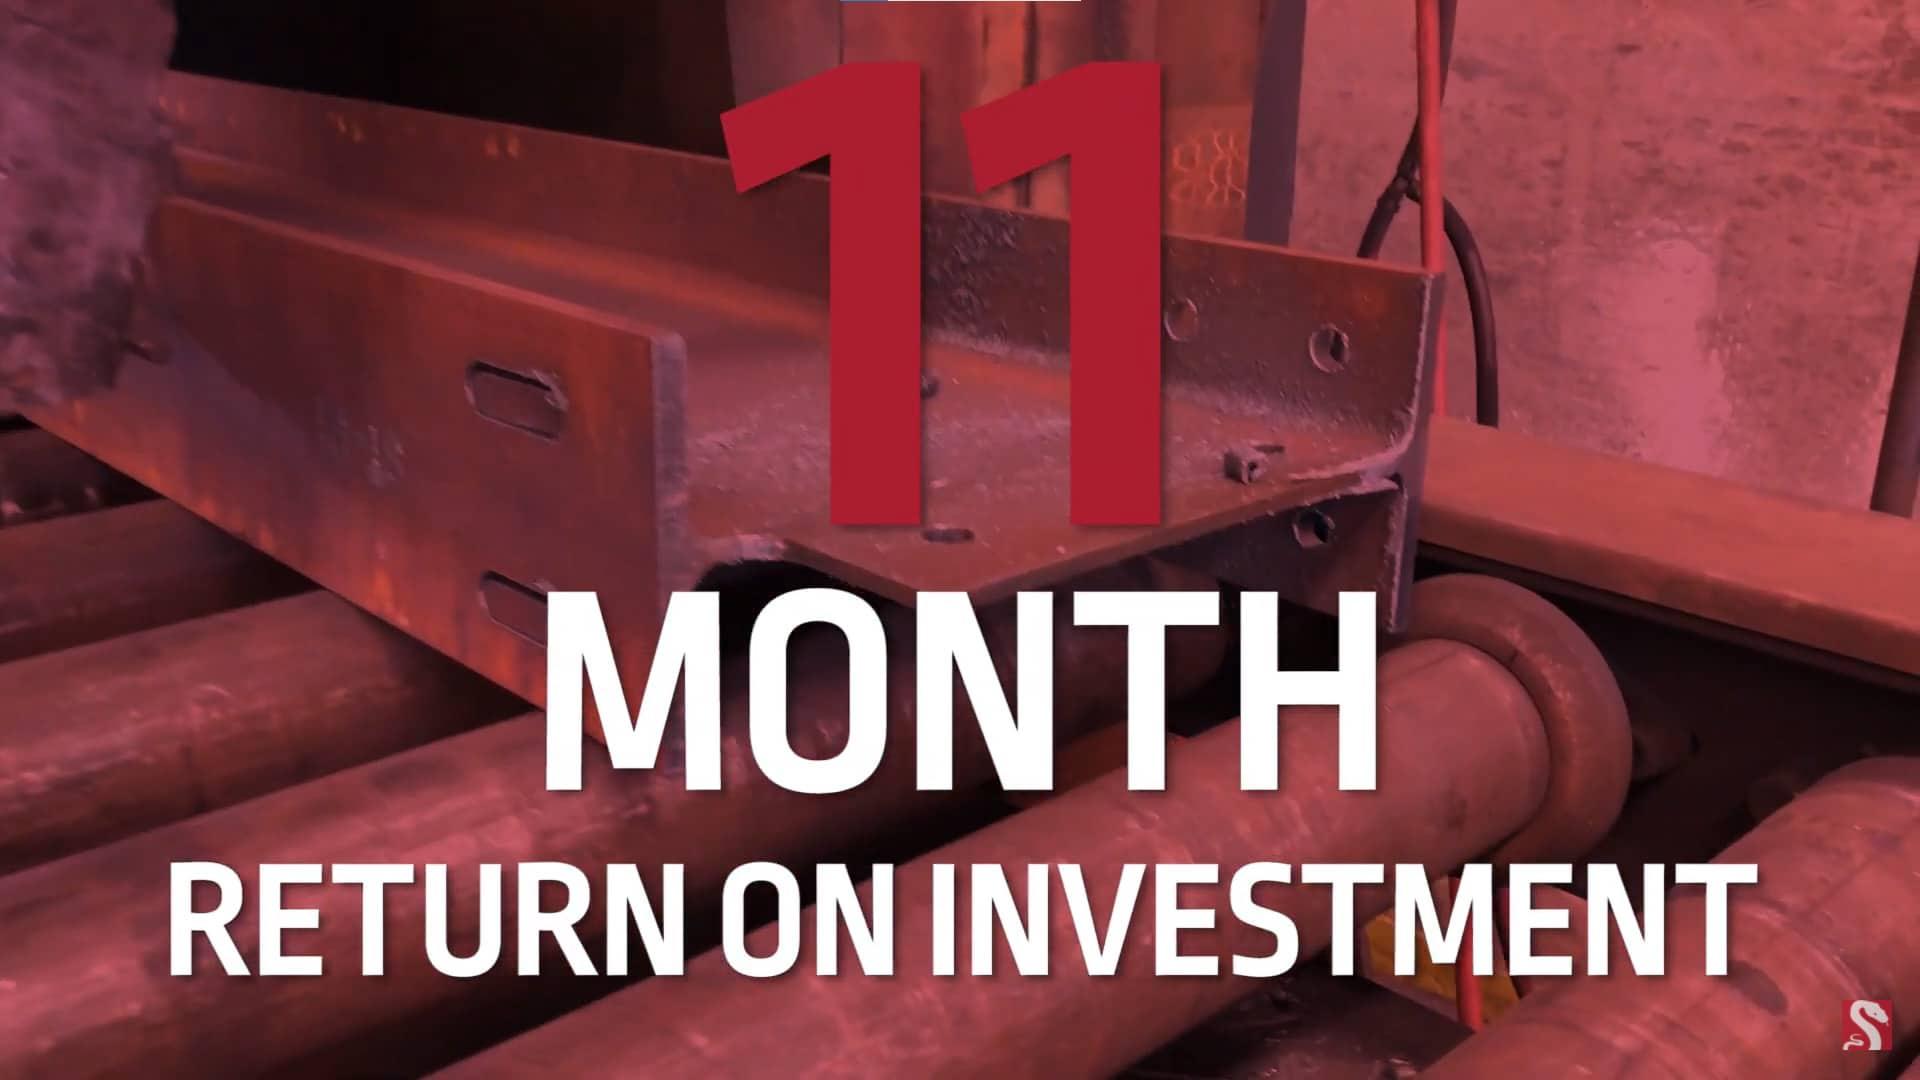 11 month return on investment